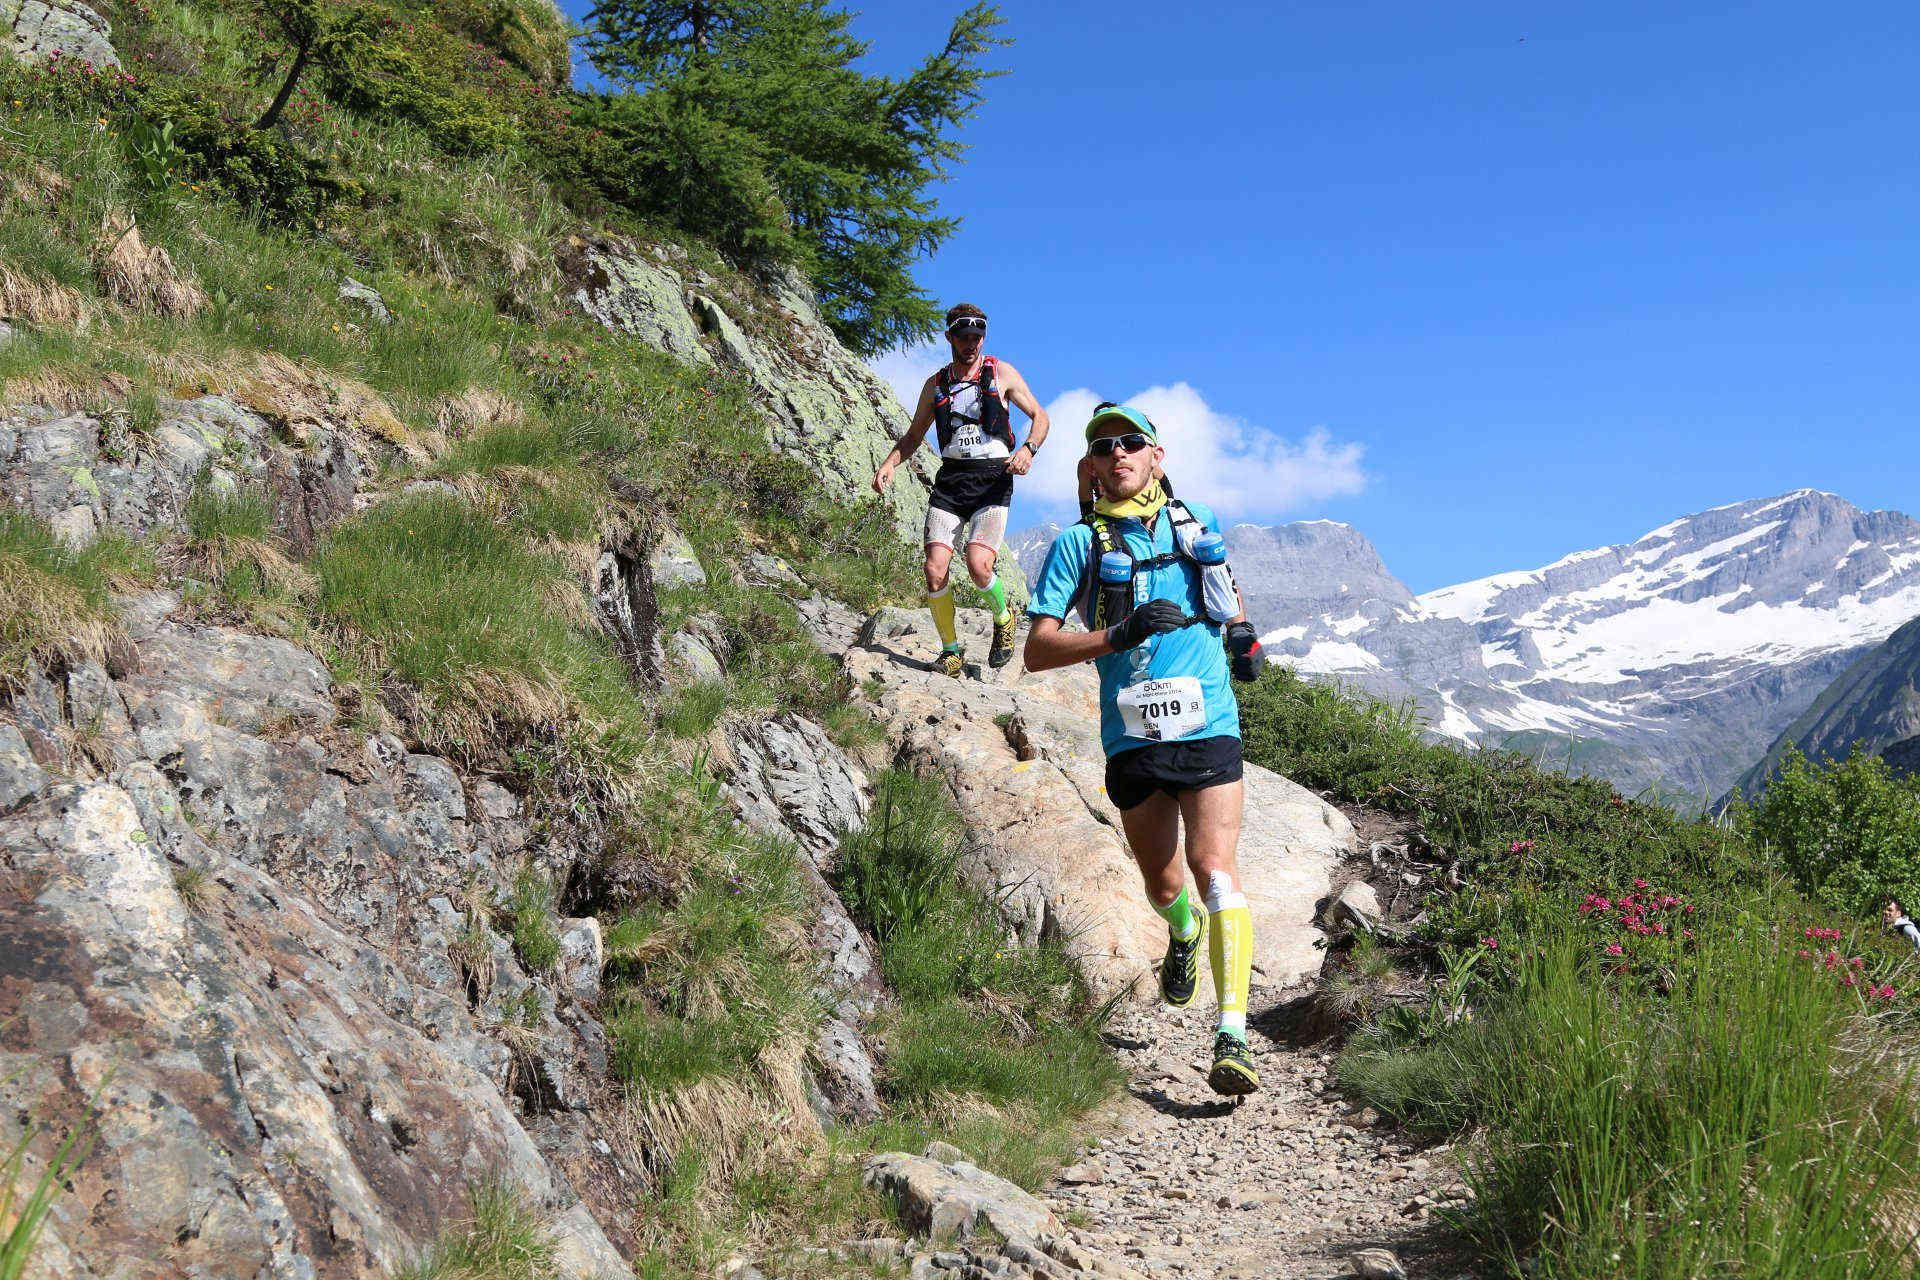 Calendrier Trail Finistere.Moelan Sur Trail 2020 Moelan Sur Mer Finistere France